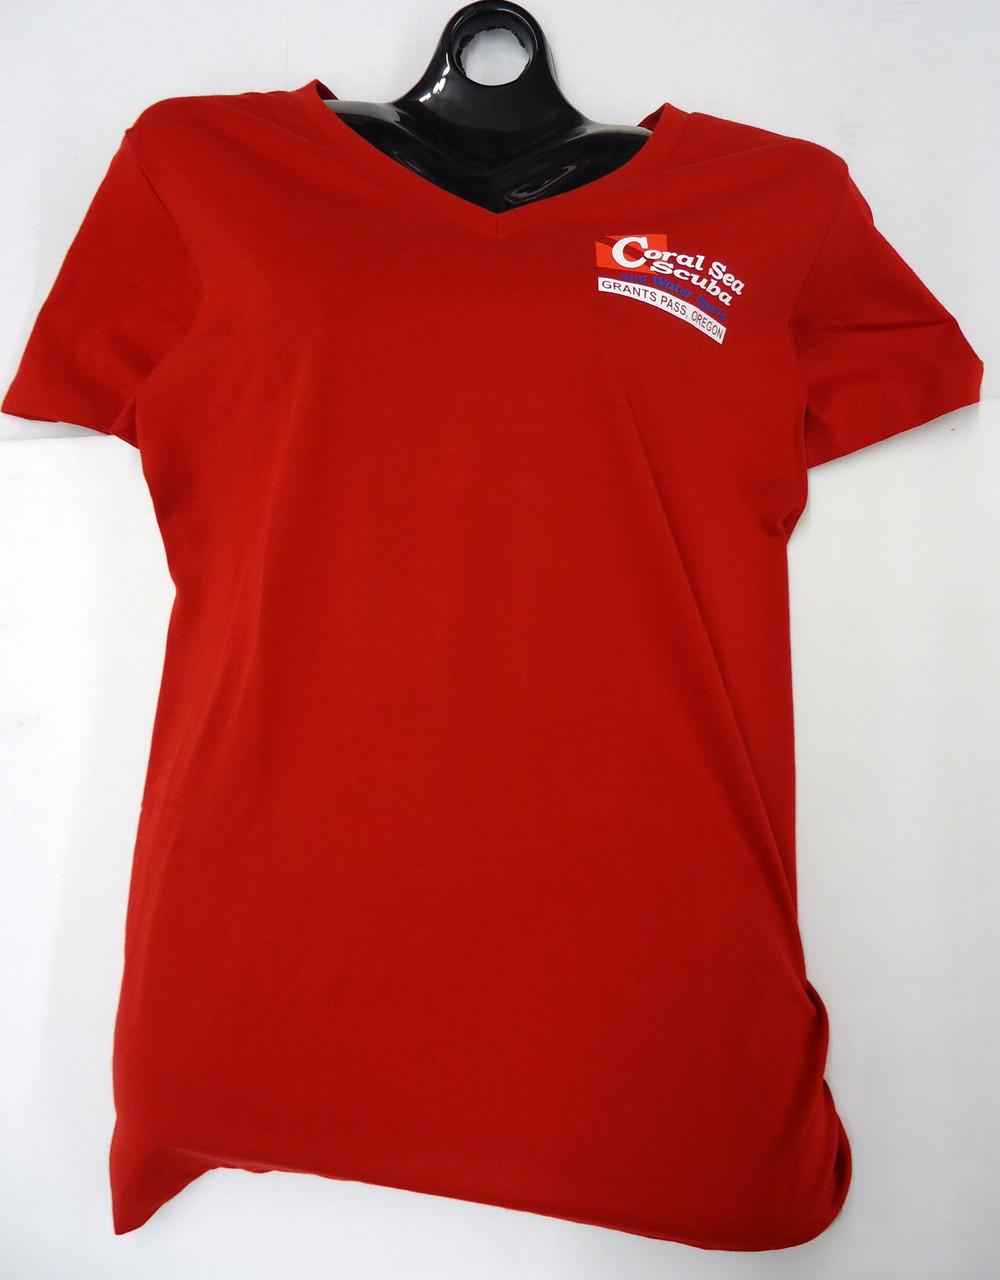 Coral Sea Scuba Logo Women's T-Shirt - Dive - Classic Red